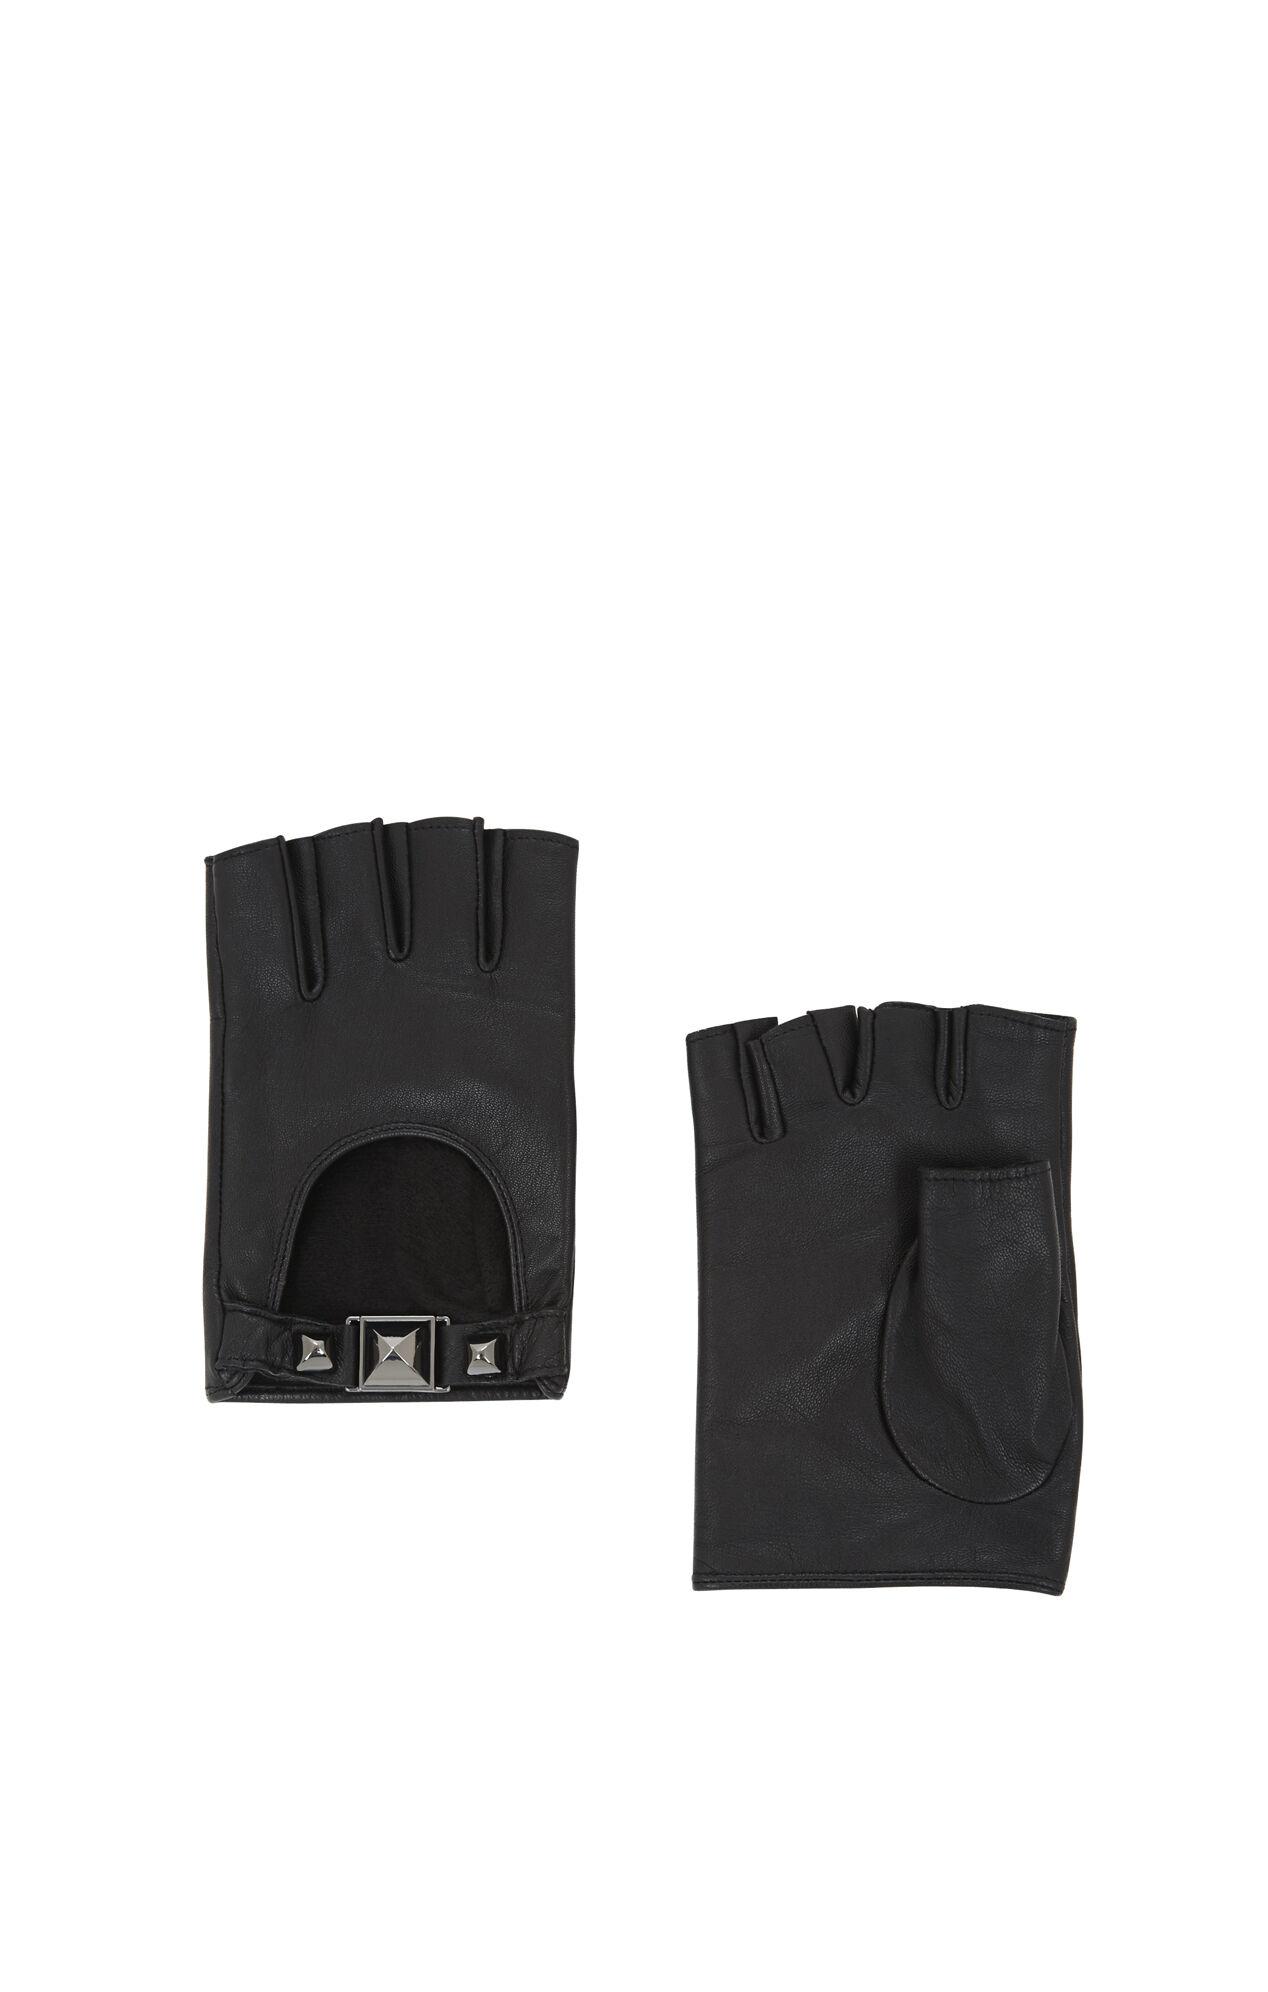 Stud Motorcycle Gloves